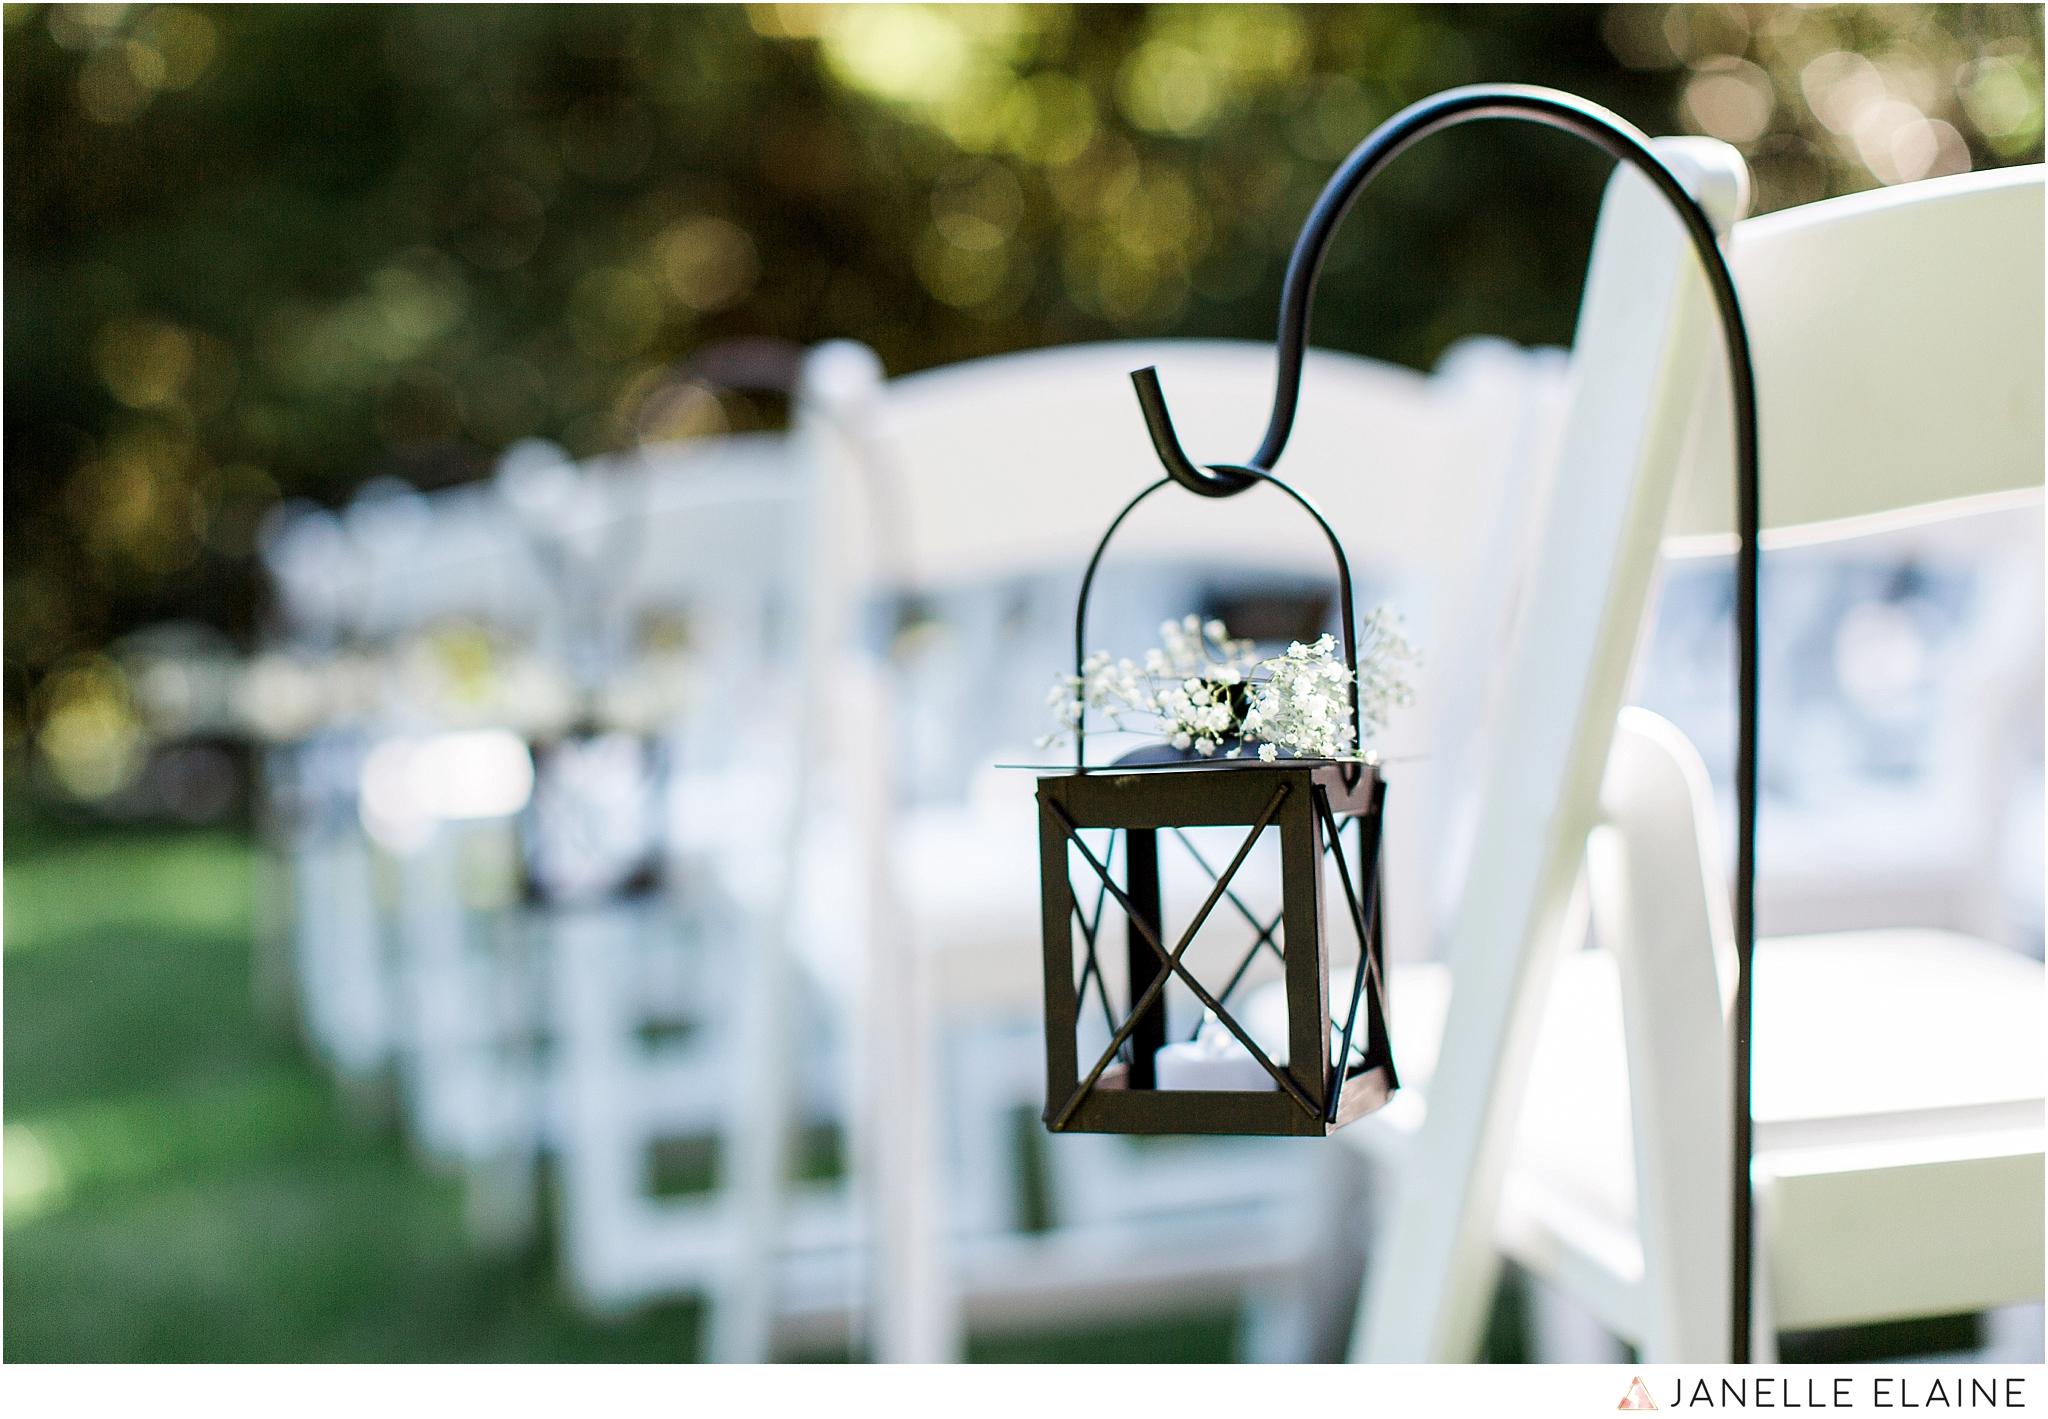 janelle elaine photography-professional wedding photographer-seattle-bellevue-robinswood house-7.jpg